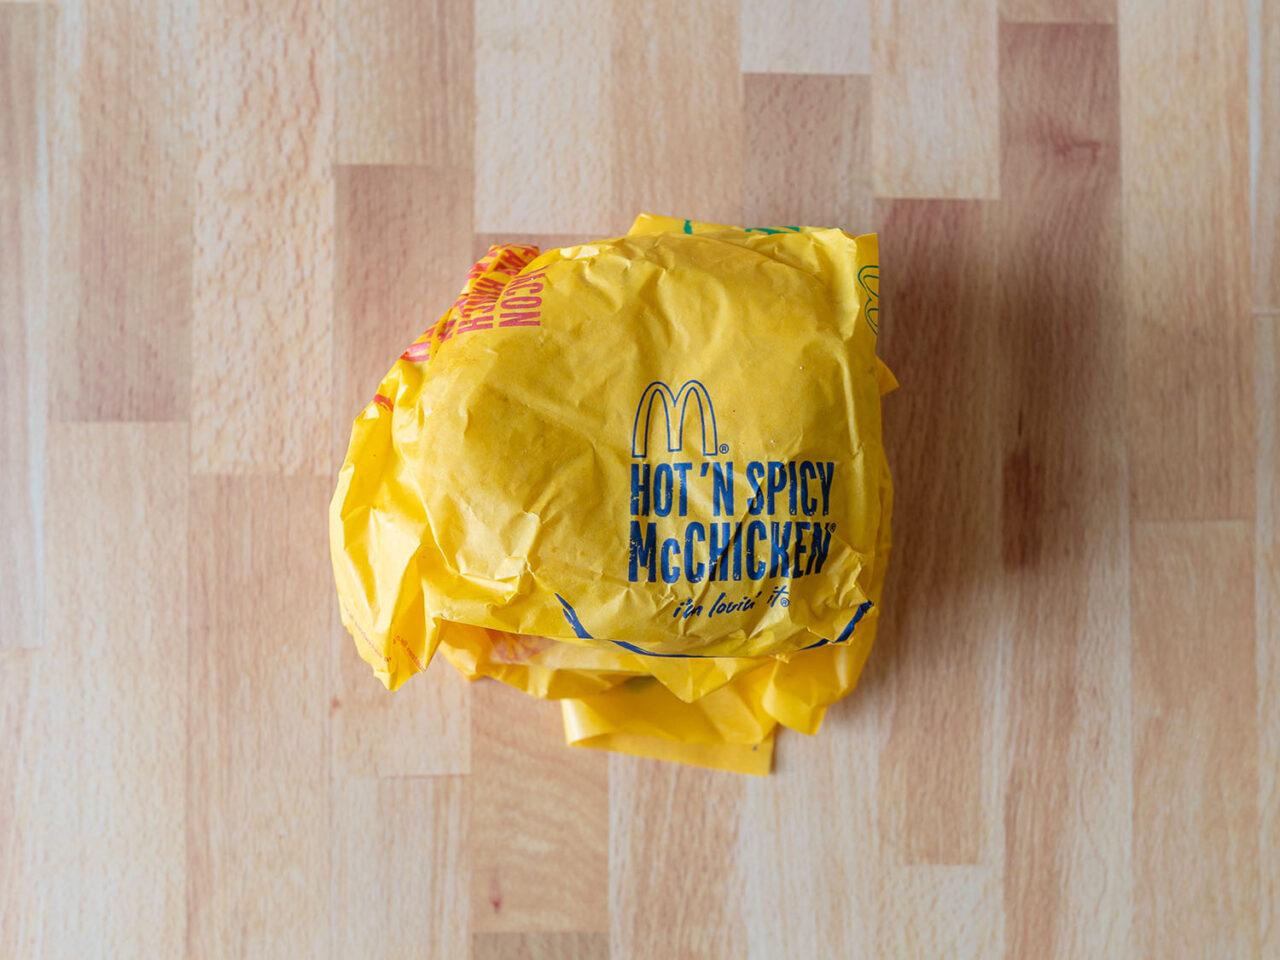 McDonald's Hot N Spicy McChicken